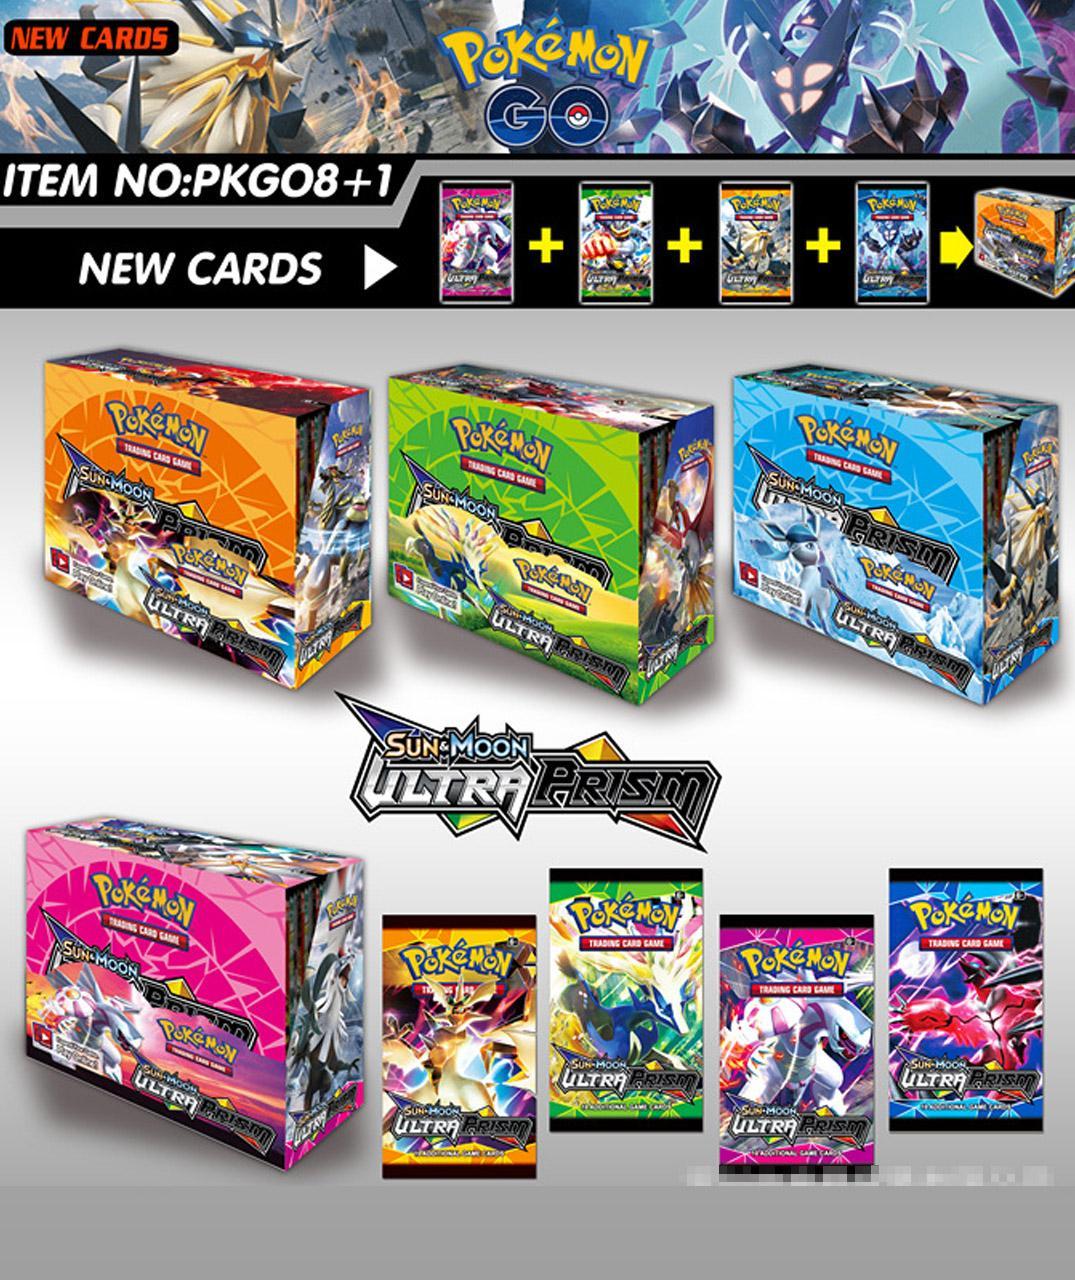 324pcs TAKARA TOMY Pet Pokemon Cards  High-end Gift Box Pokemon Cards   The Toy Of  Children